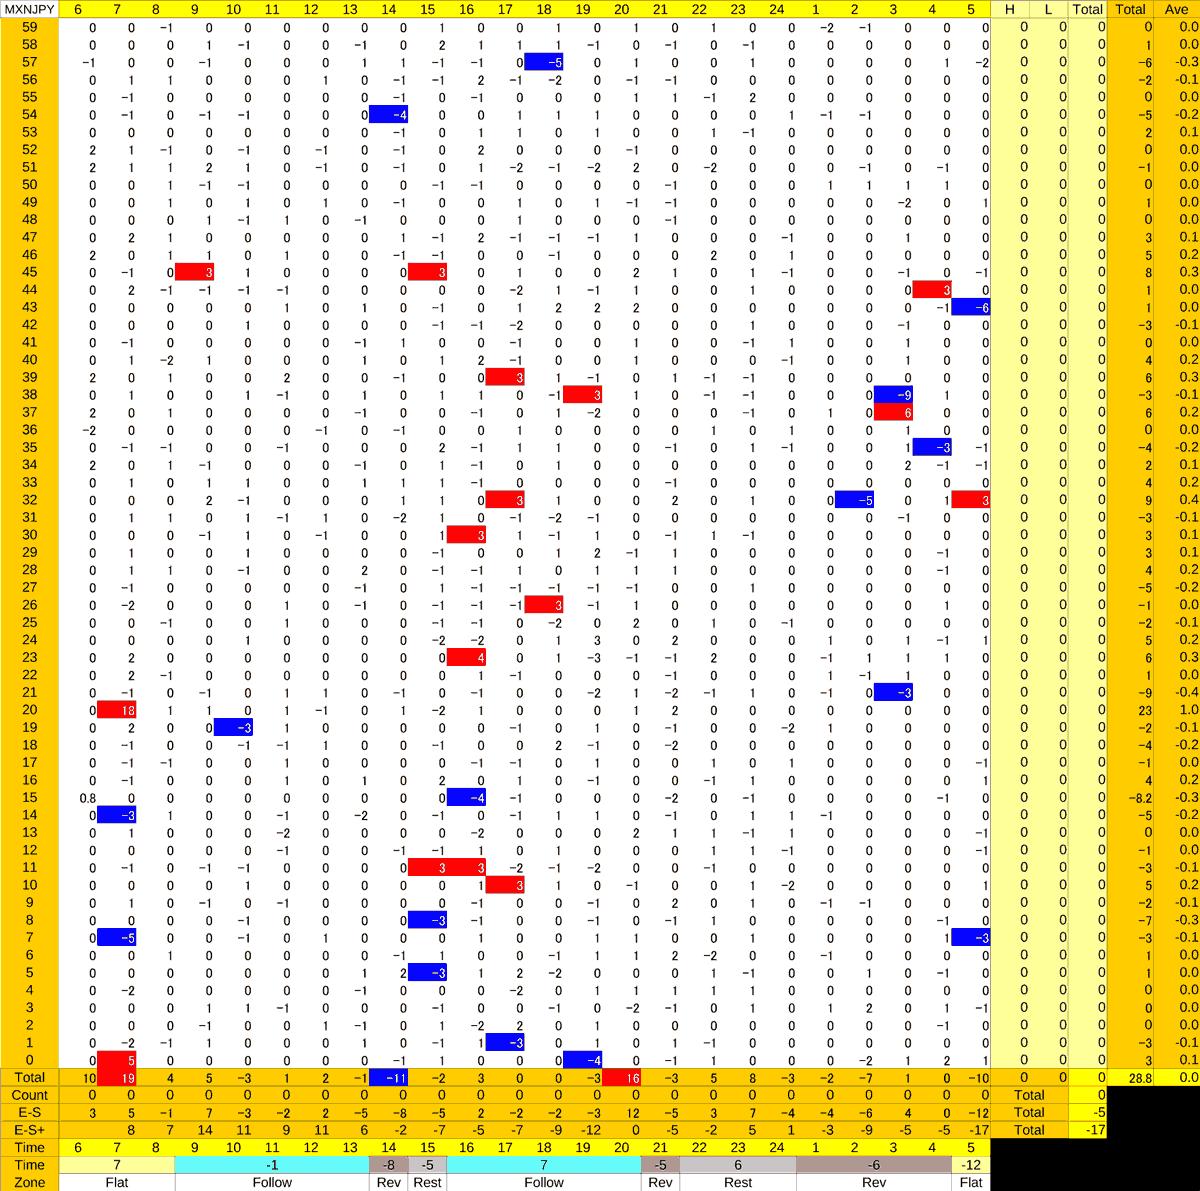 20200907_HS(3)MXNJPY